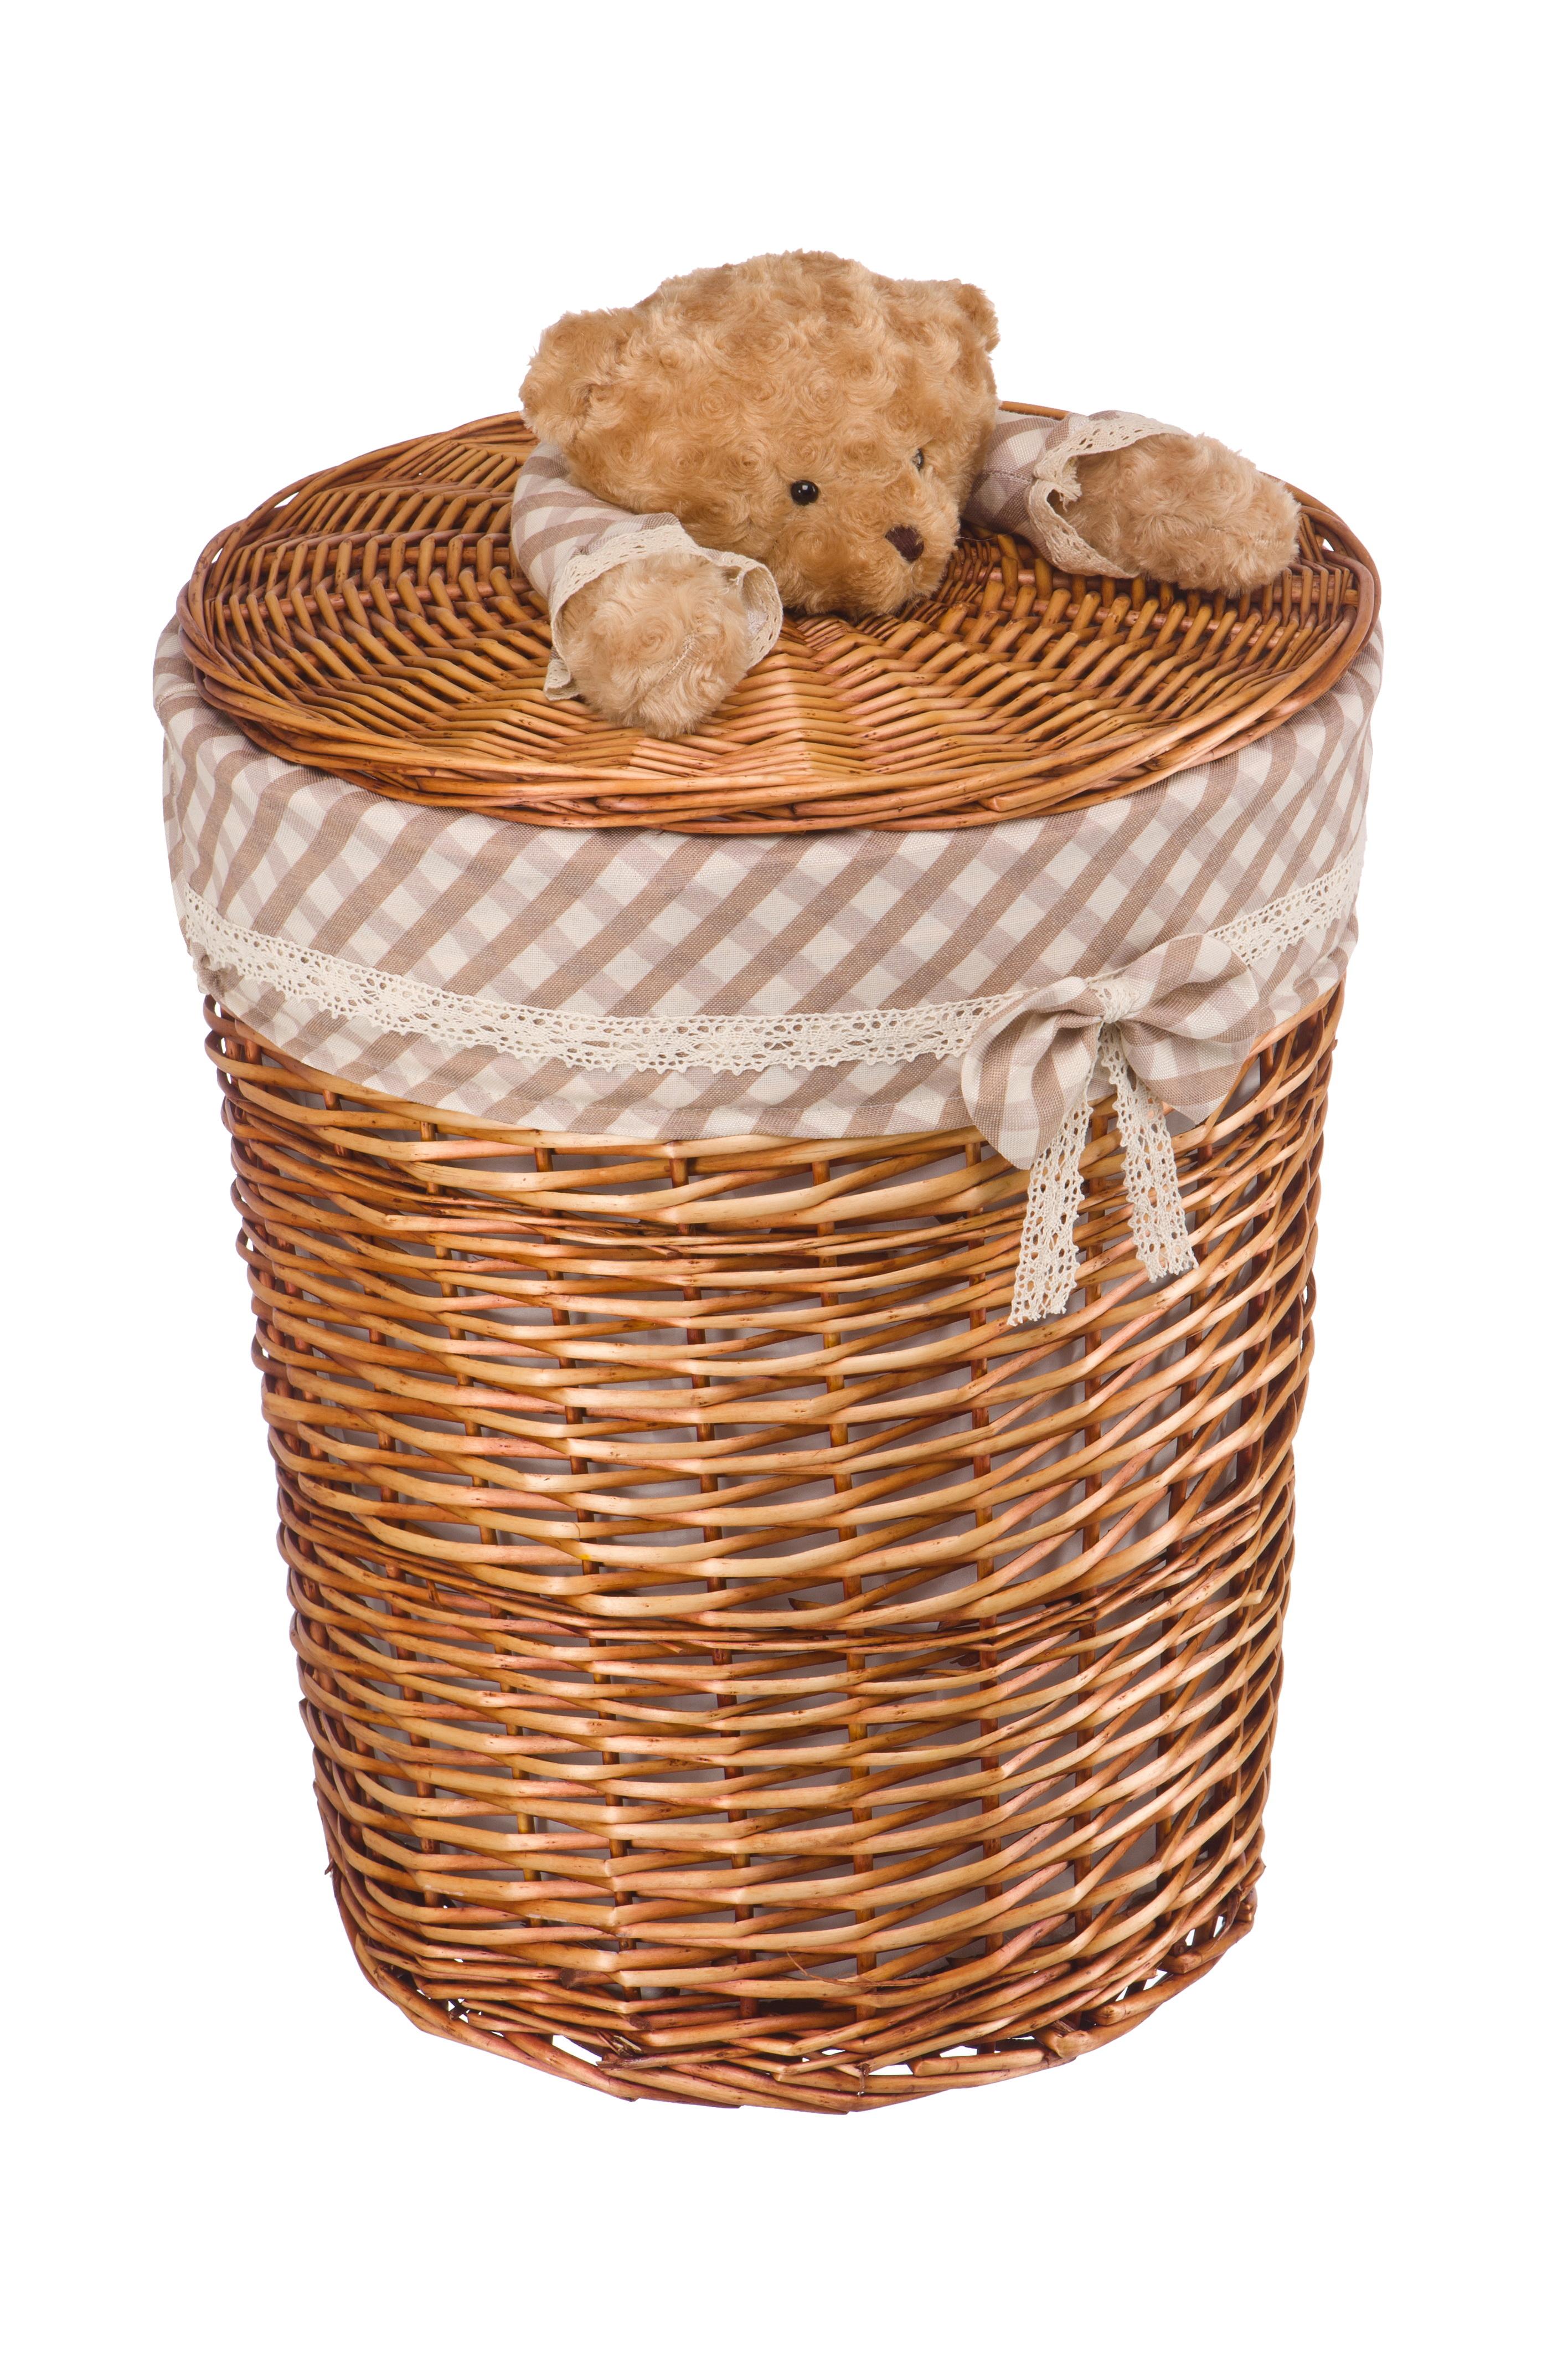 Ящики и корзины для игрушек Natural House Корзина Natural House «Медвежонок» ива L коричневый teak house корзина для белья bubble